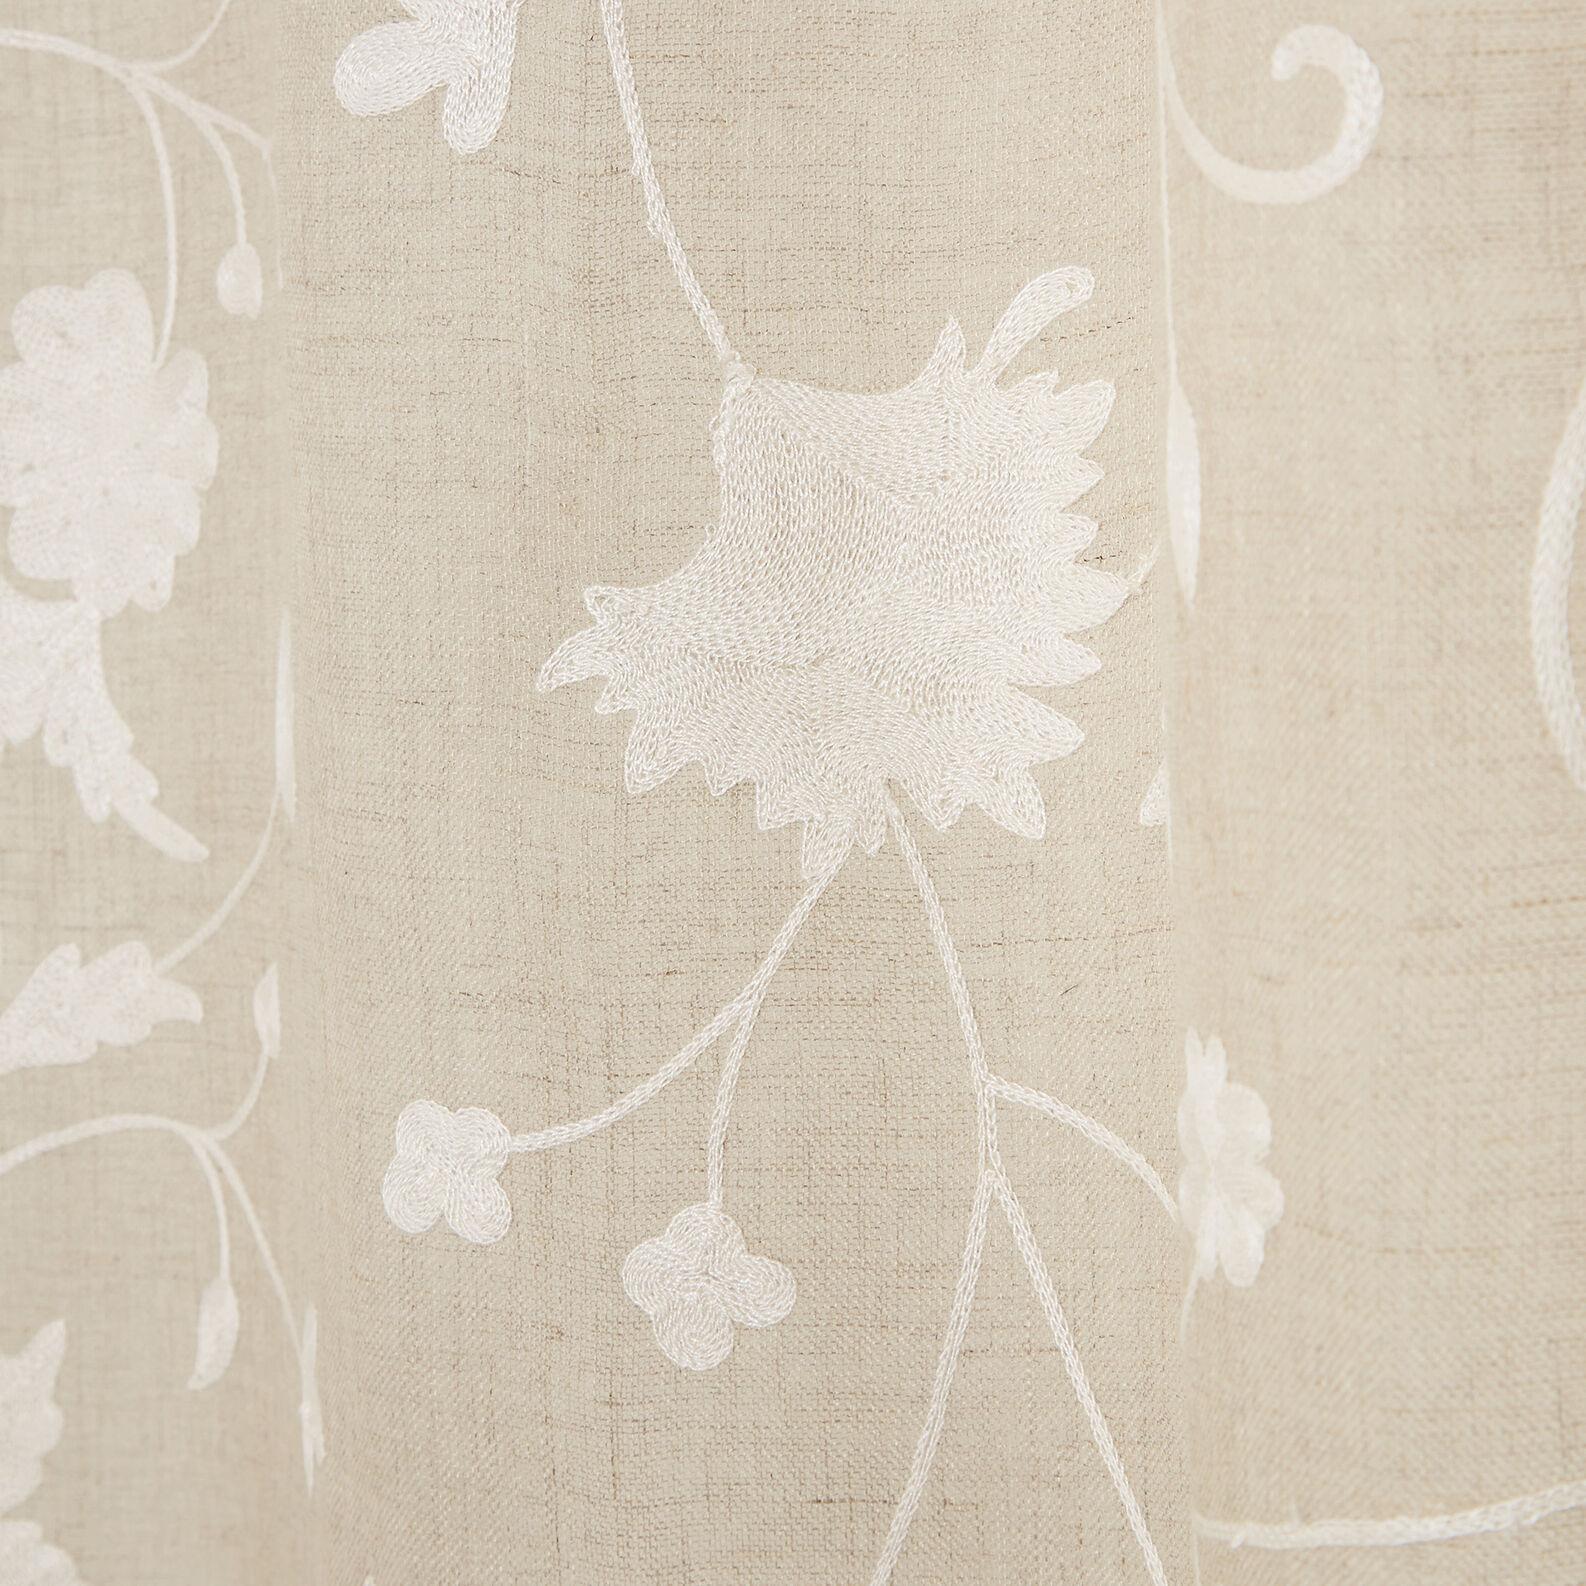 Tenda puro lino ricamo floreale